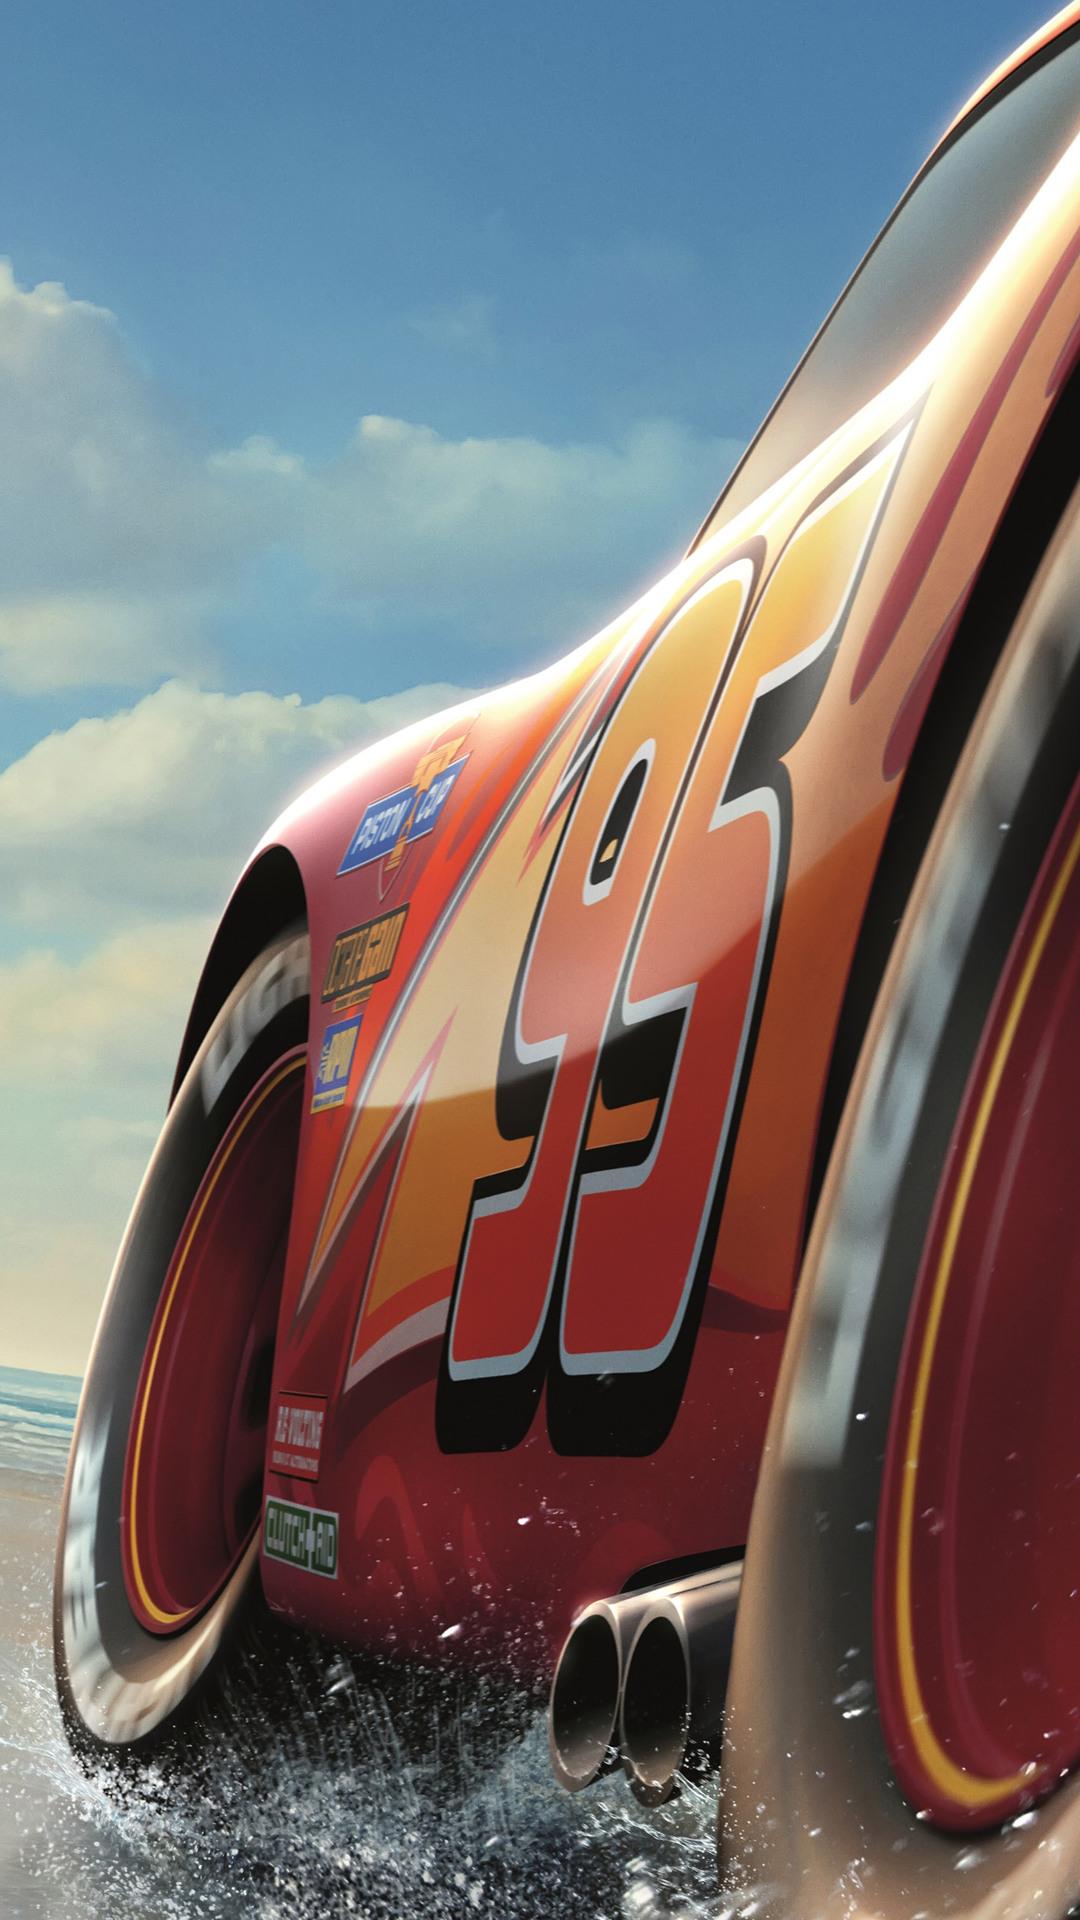 1080x1920 Cars 3 8k Disney Movie Iphone 7,6s,6 Plus, Pixel ...